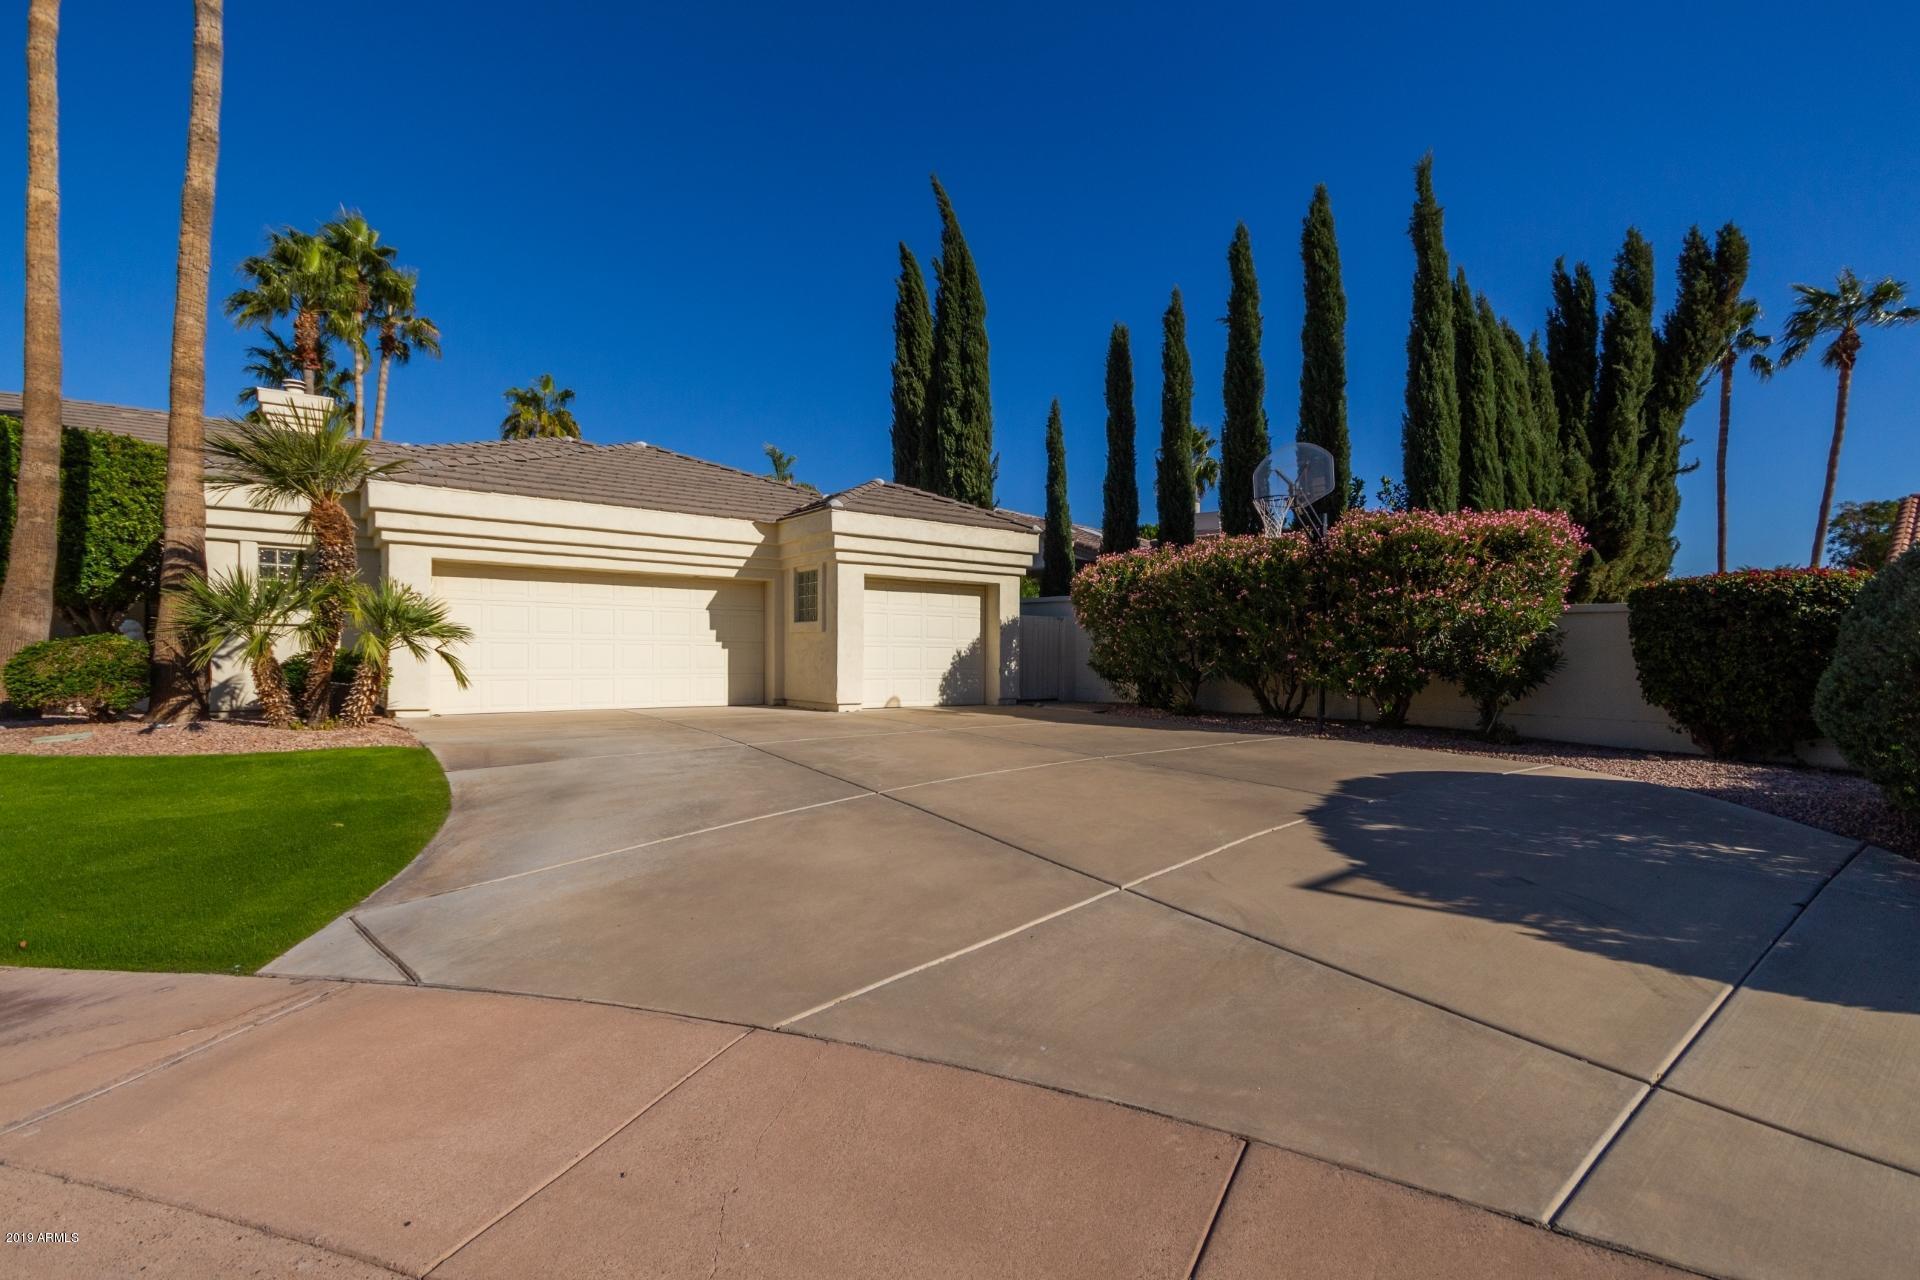 Photo of 11434 E MISSION Lane, Scottsdale, AZ 85259